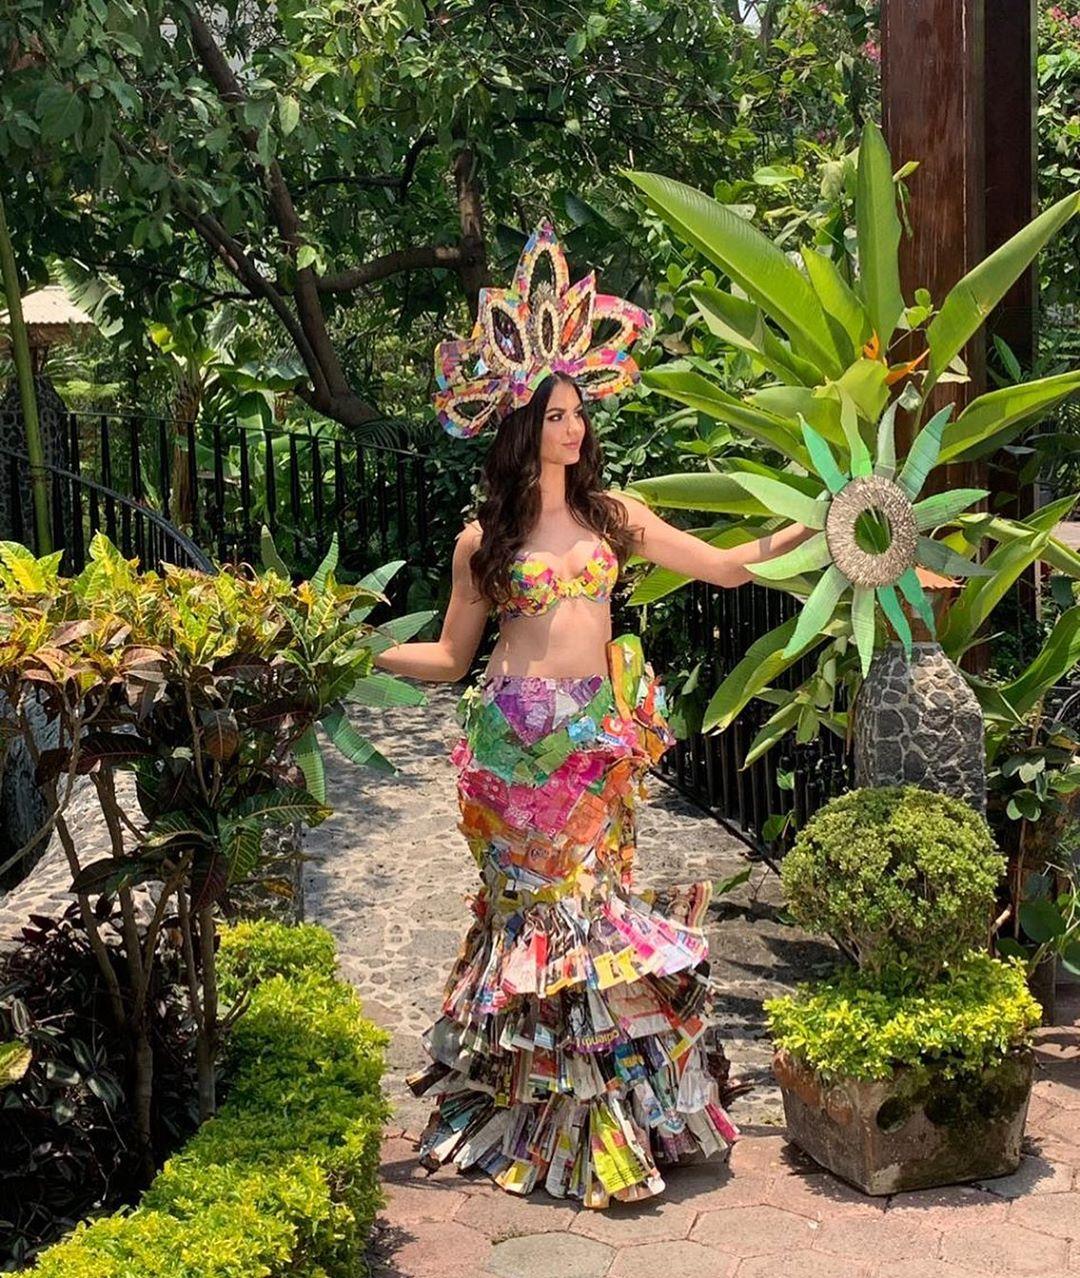 hilary islas, miss earth mexico 2019. - Página 6 60458810